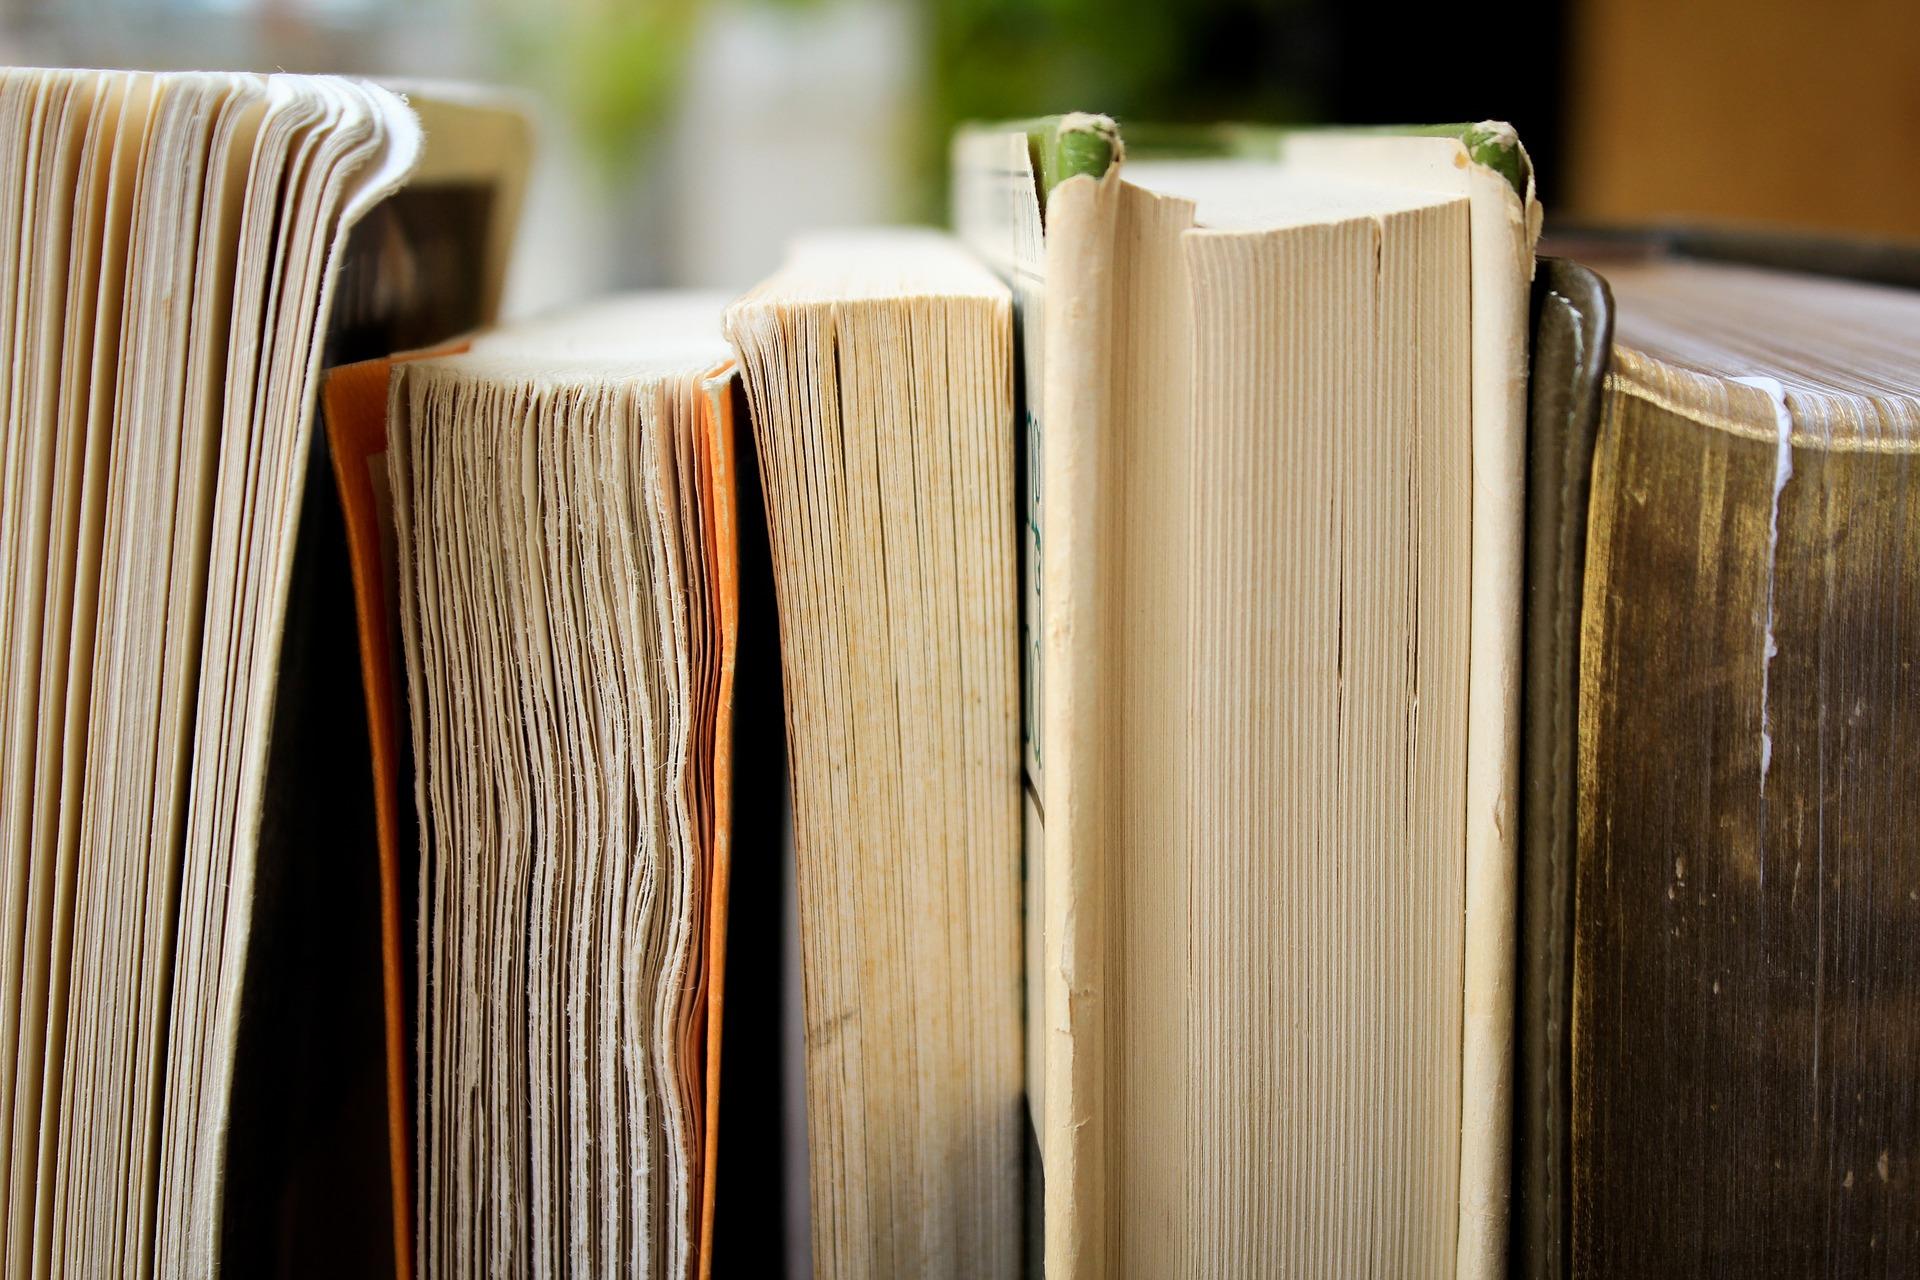 Tranches de différents livres